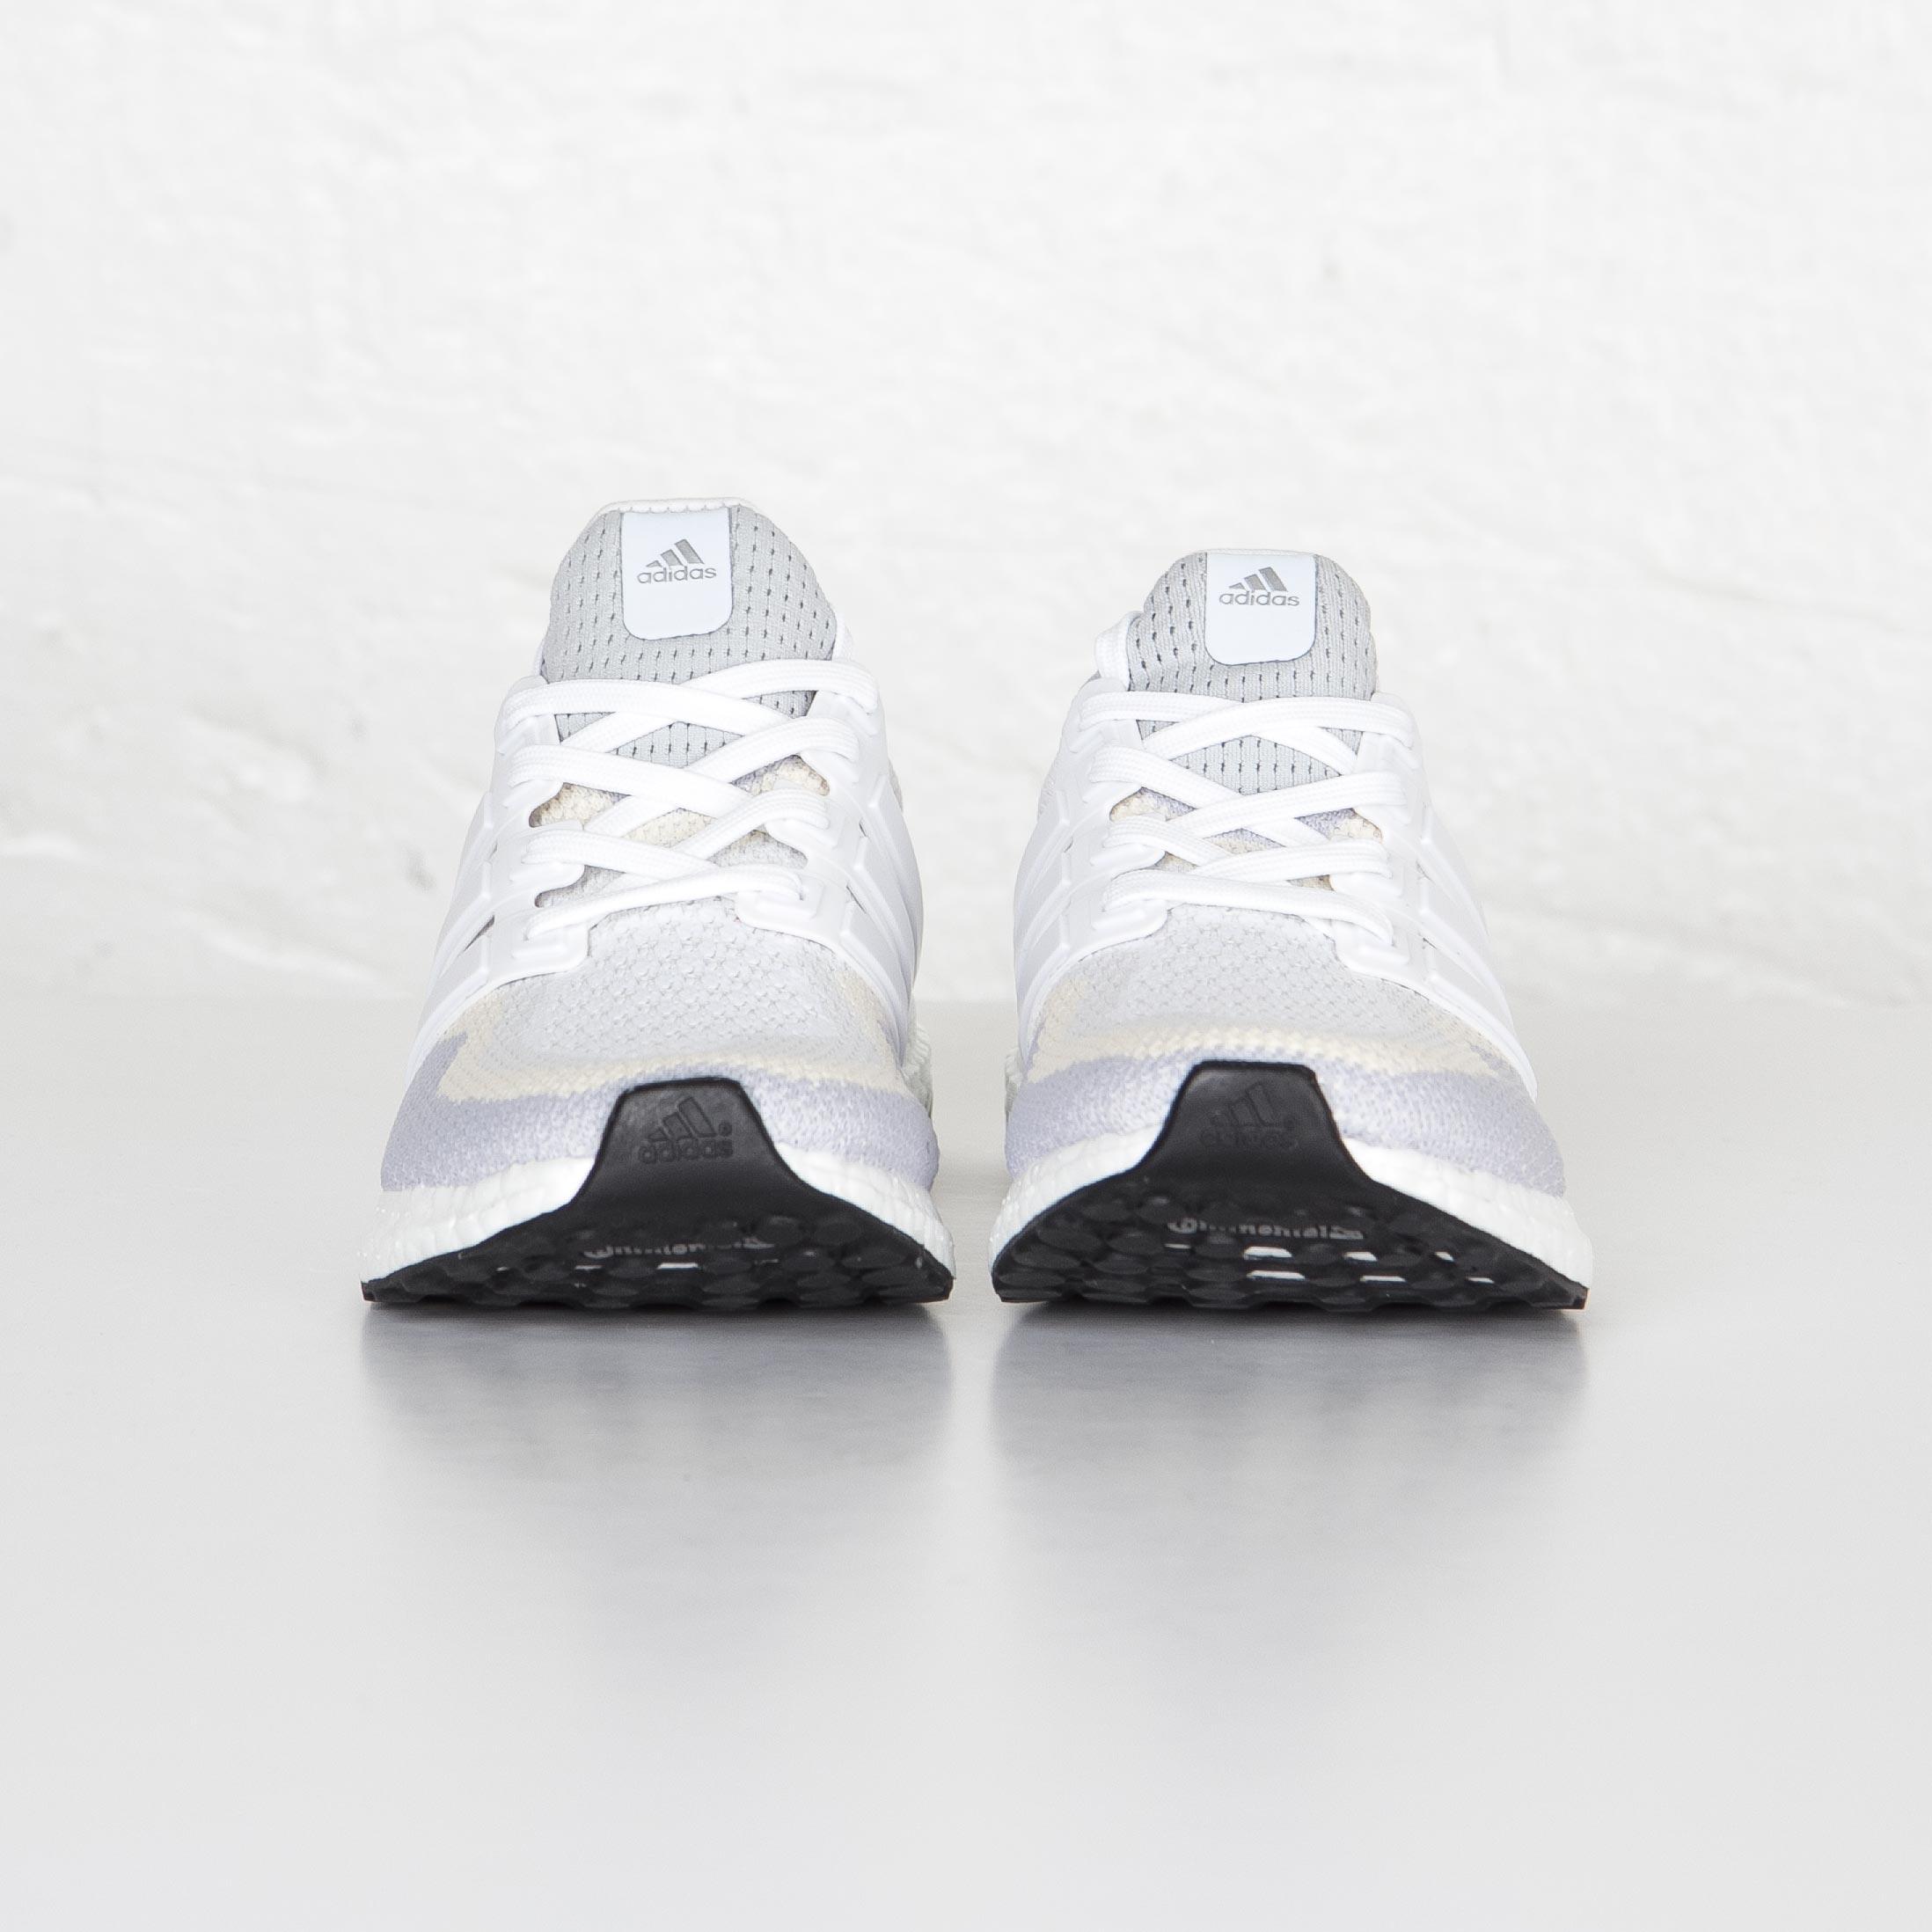 7e6c231621b4 adidas Ultra Boost W - Af5142 - Sneakersnstuff